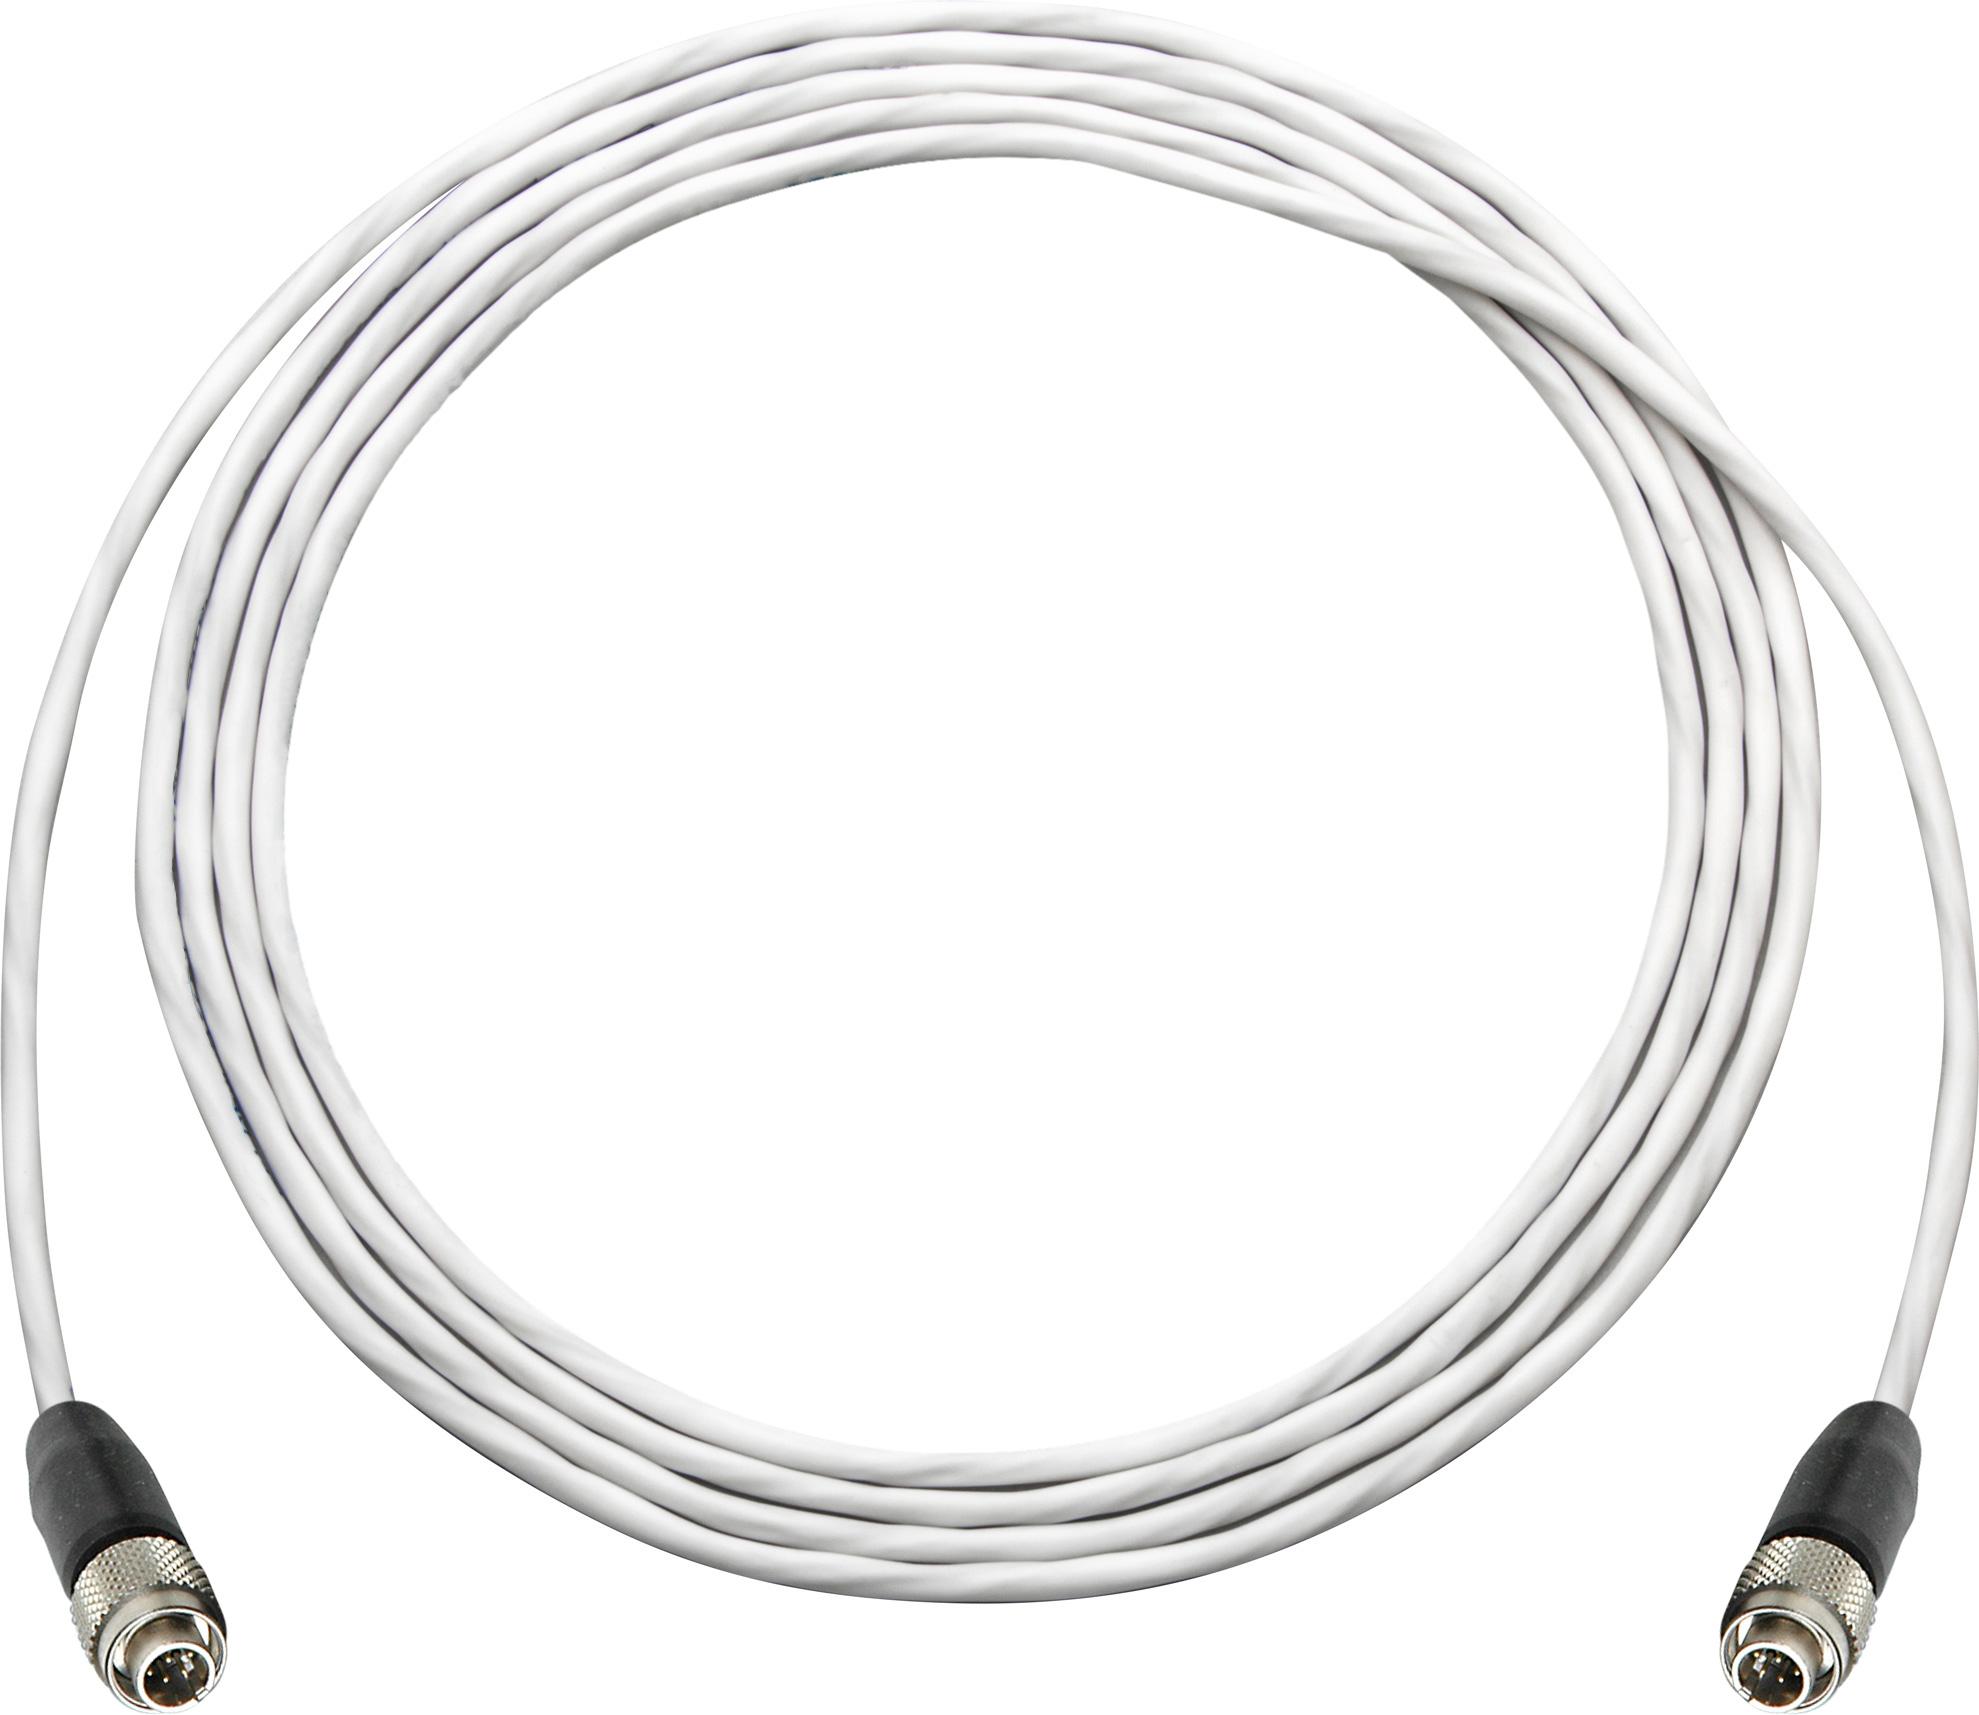 Sony CCA-5 BVP HDC Camera MSU RCP CNU 700 Remote Control Cable 8 pin to 8 pin